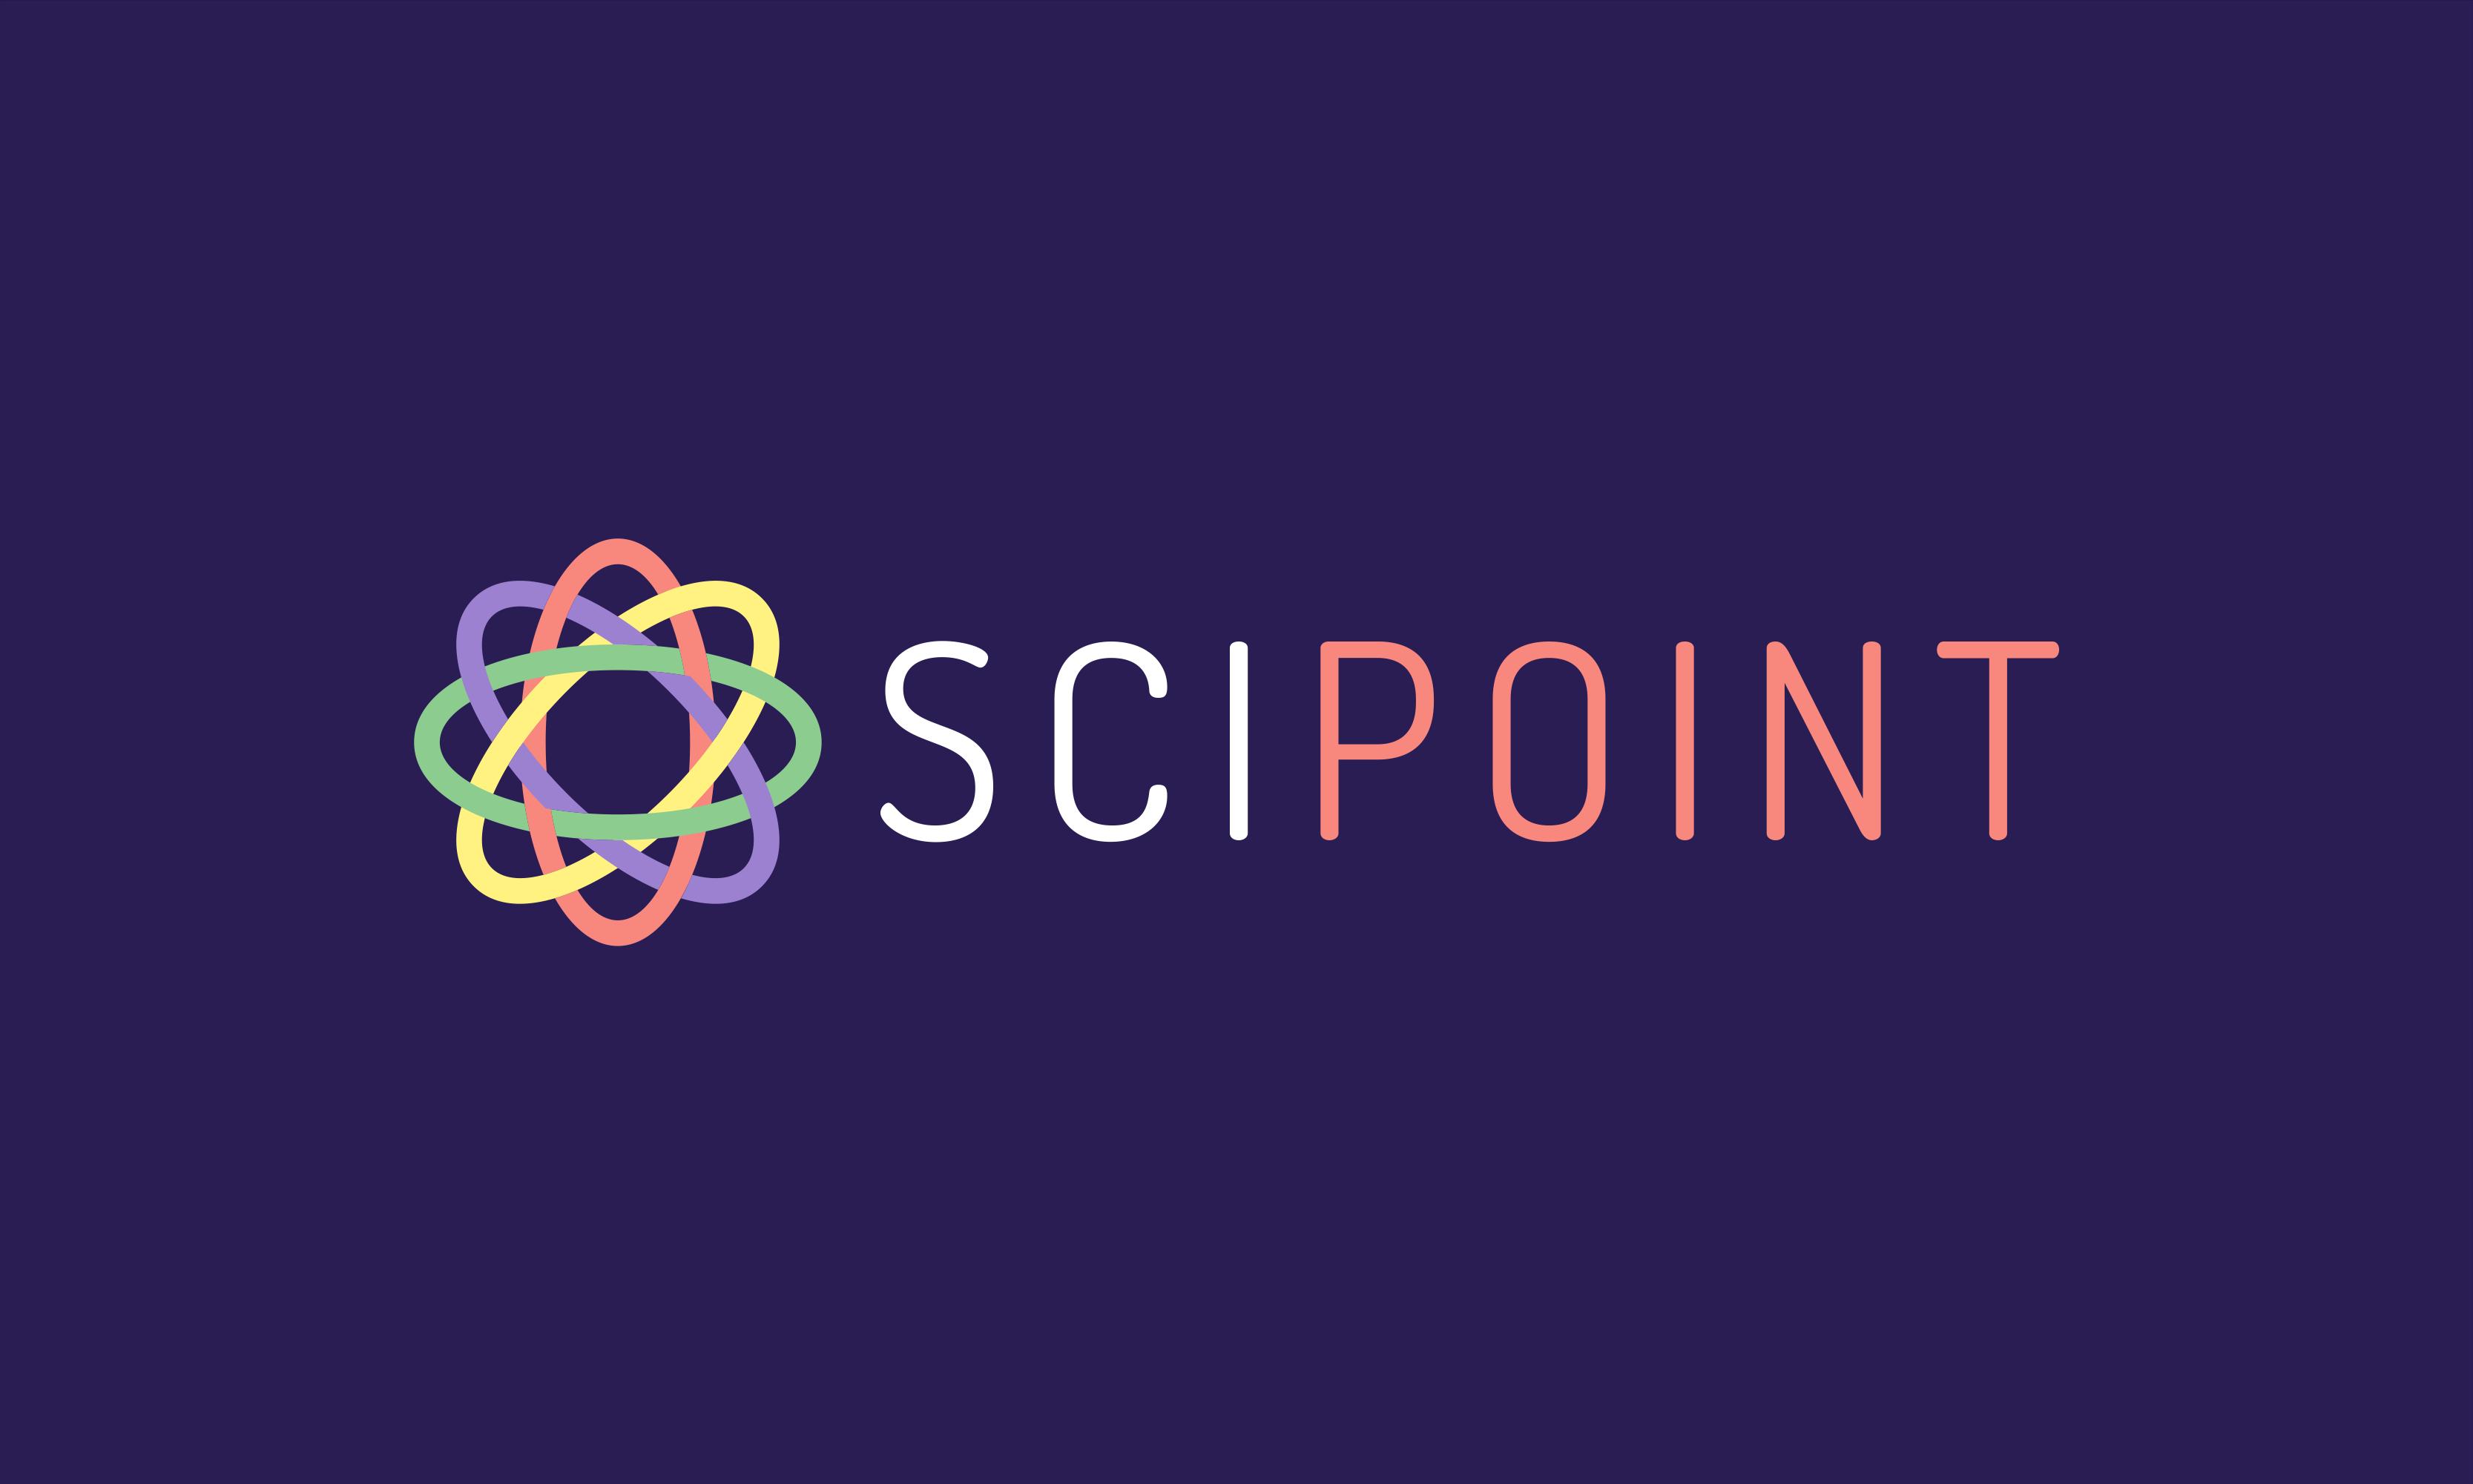 Scipoint